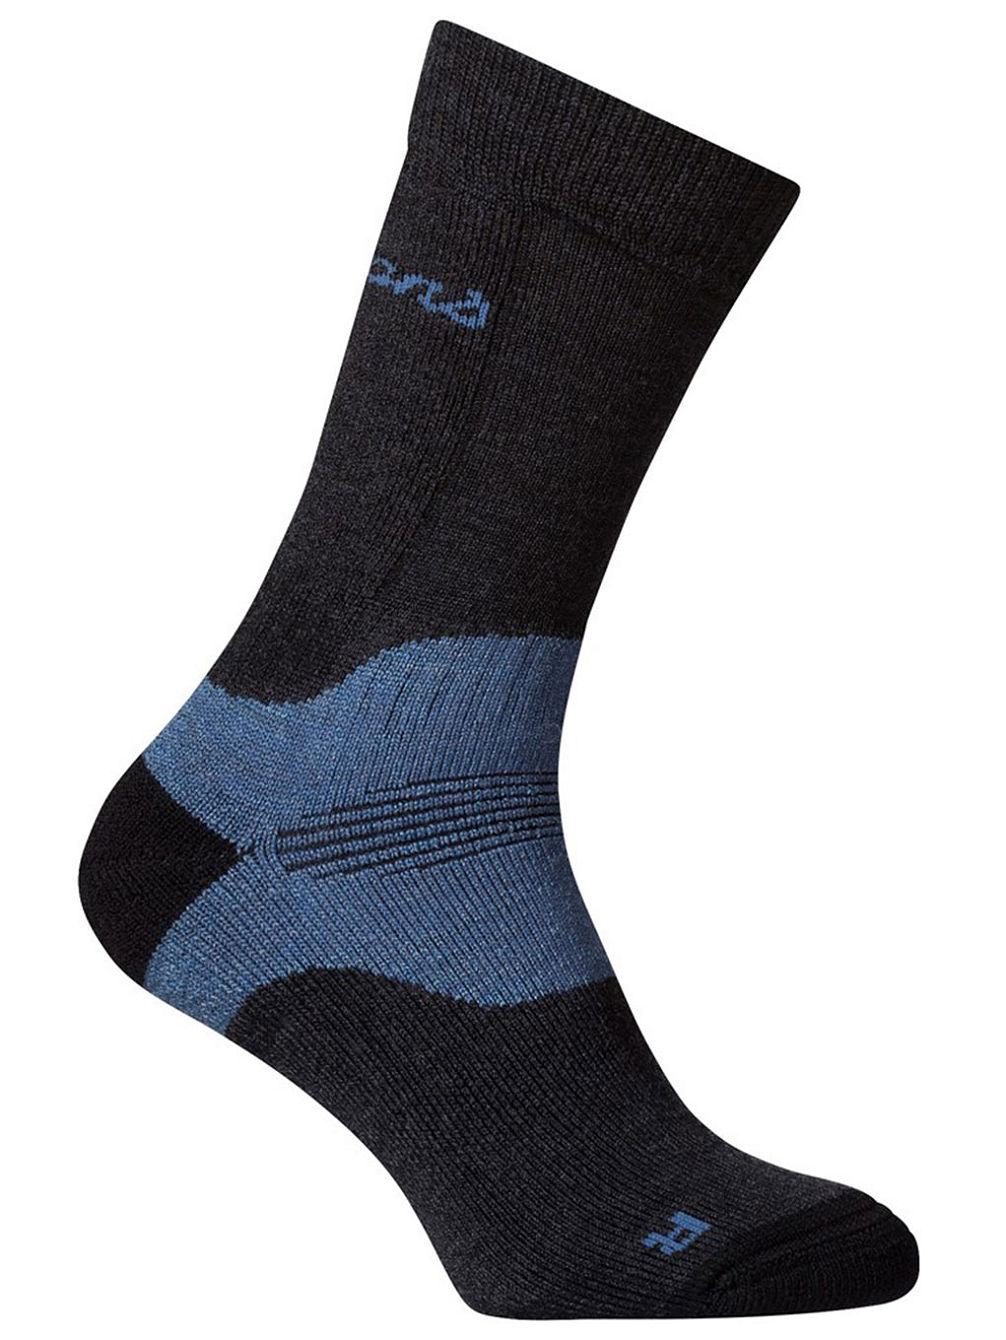 Bergans Loen Mid Trekking Wool (36-39) Socken